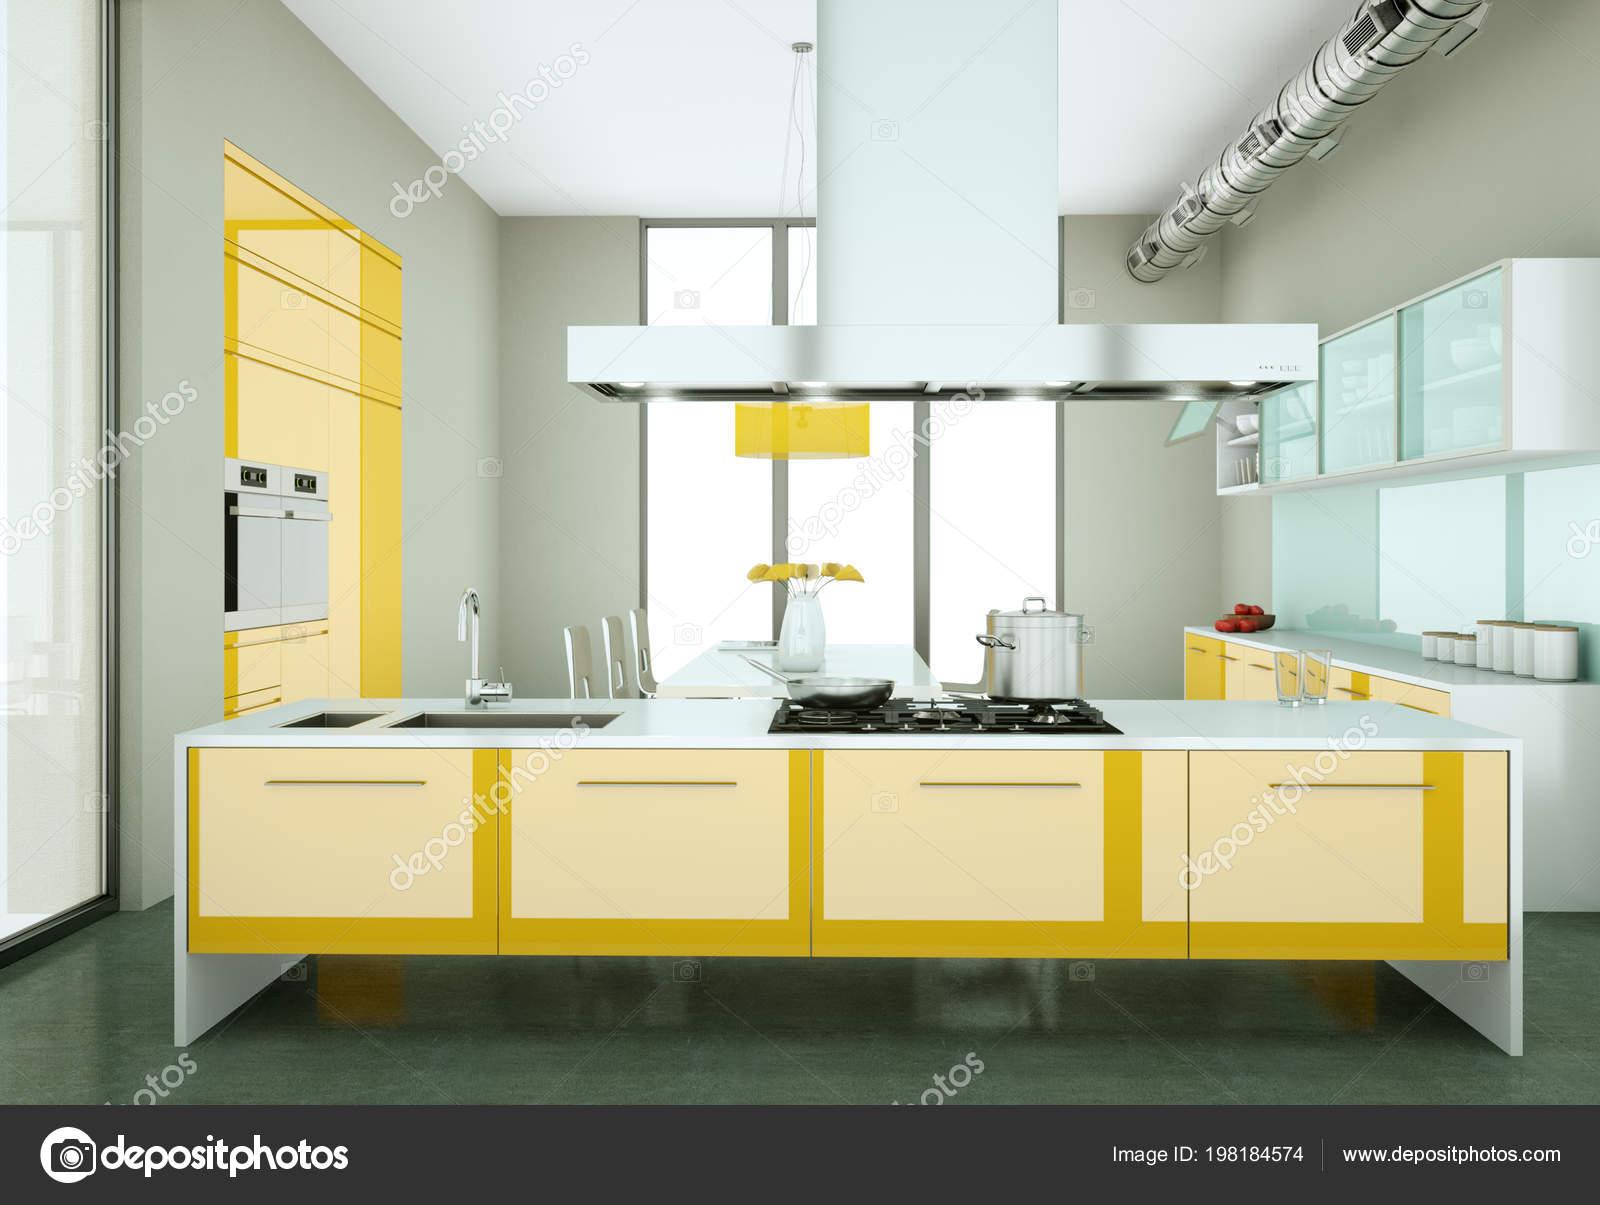 Cuisine Moderne Jaune cuisine moderne jaune dans un loft avec un beau design